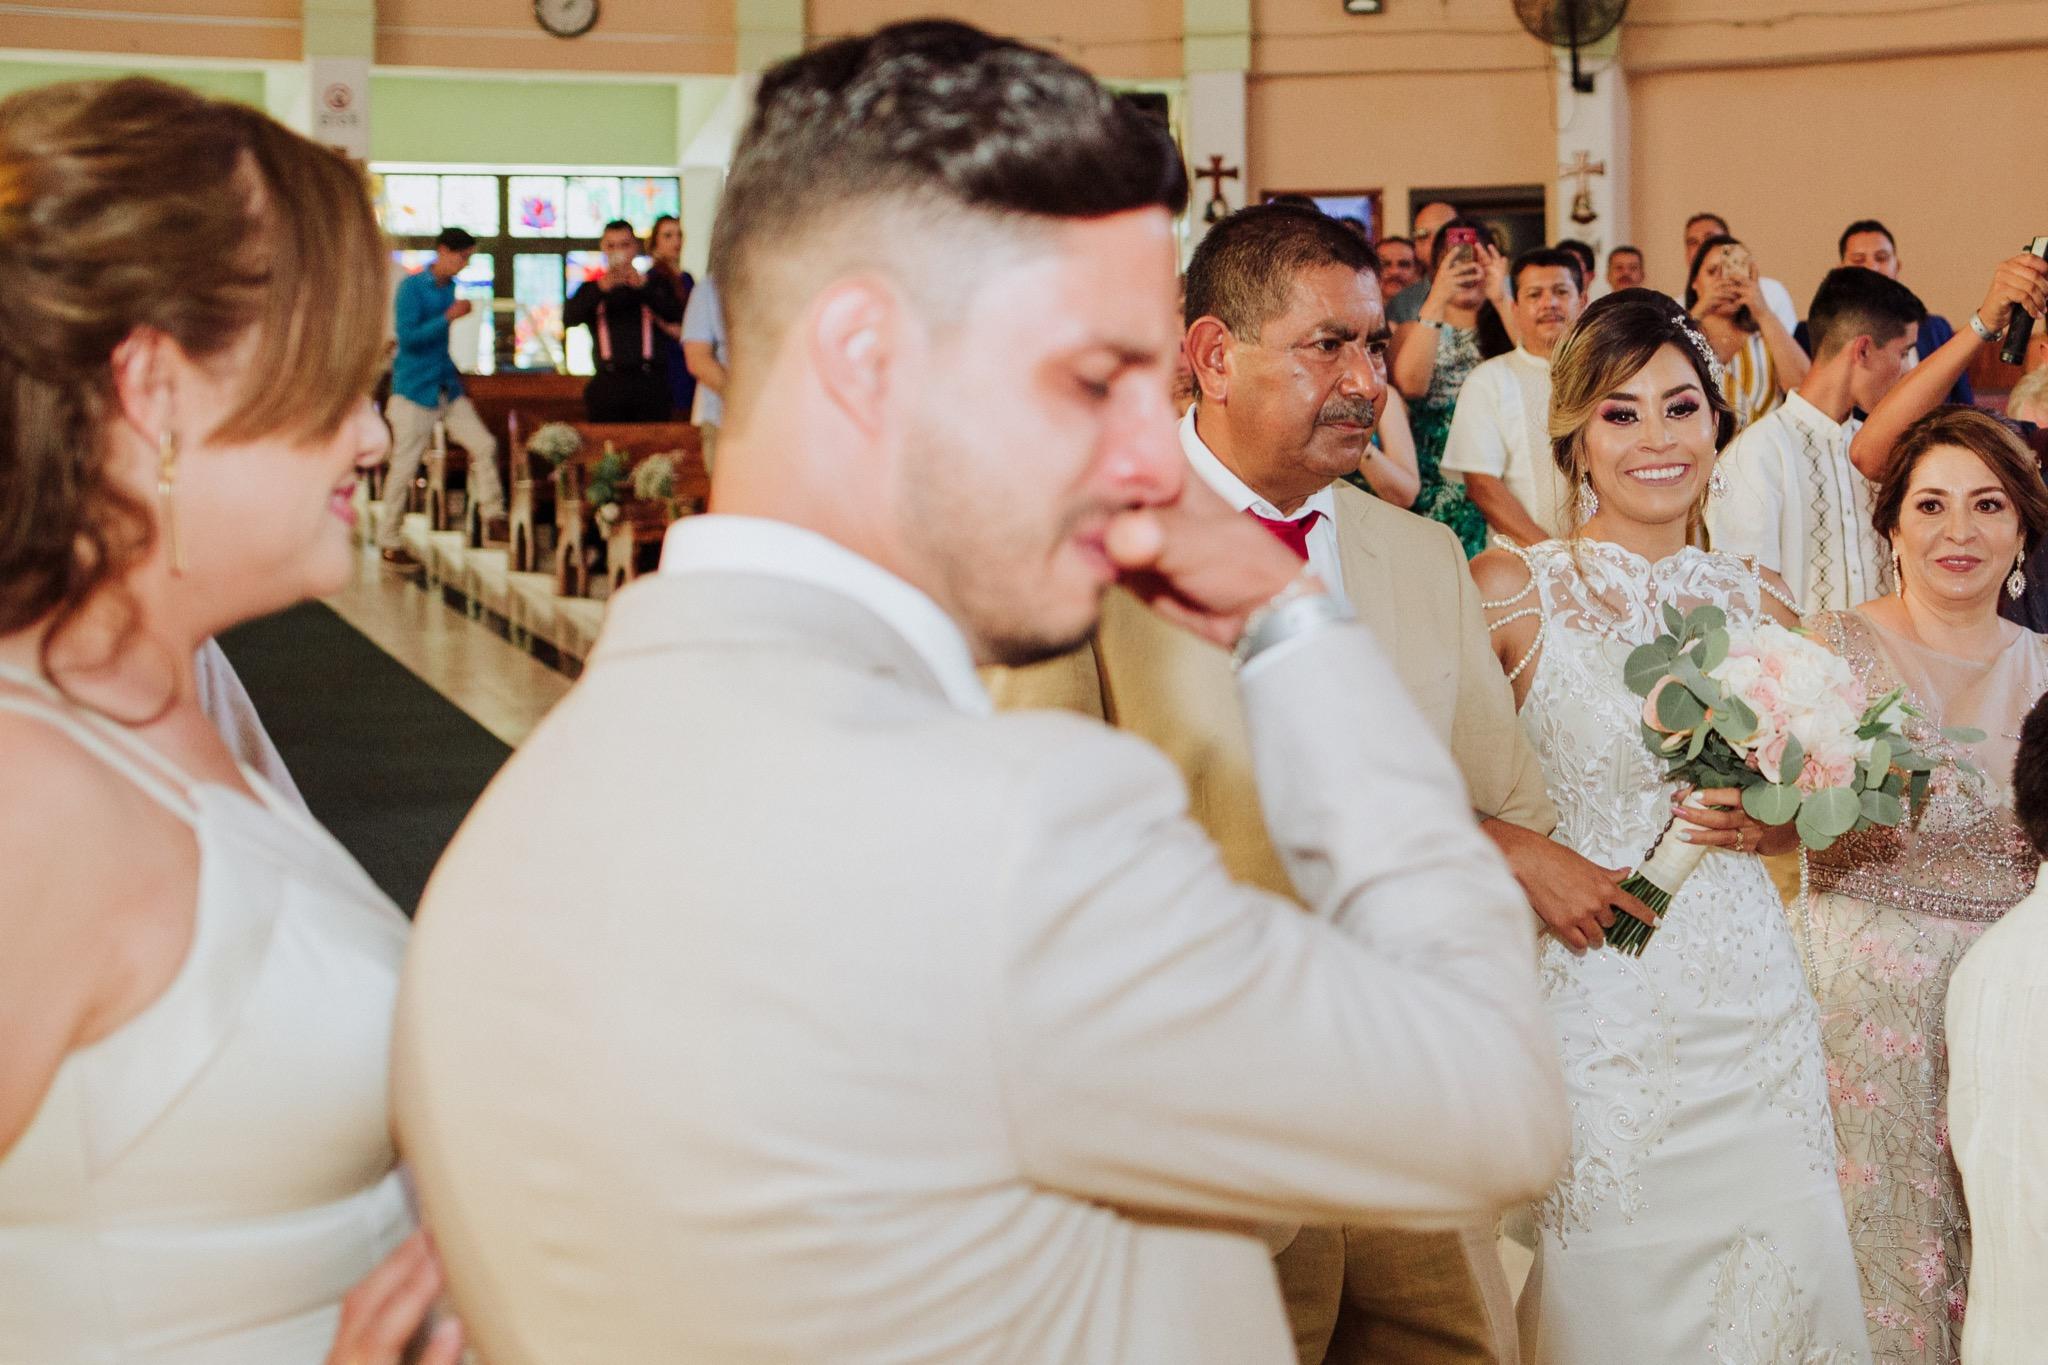 Javier_noriega_fotografo_bodas_profesional_zacatecas_mexico_mazatlan_sinaloa_photographer_weddings21